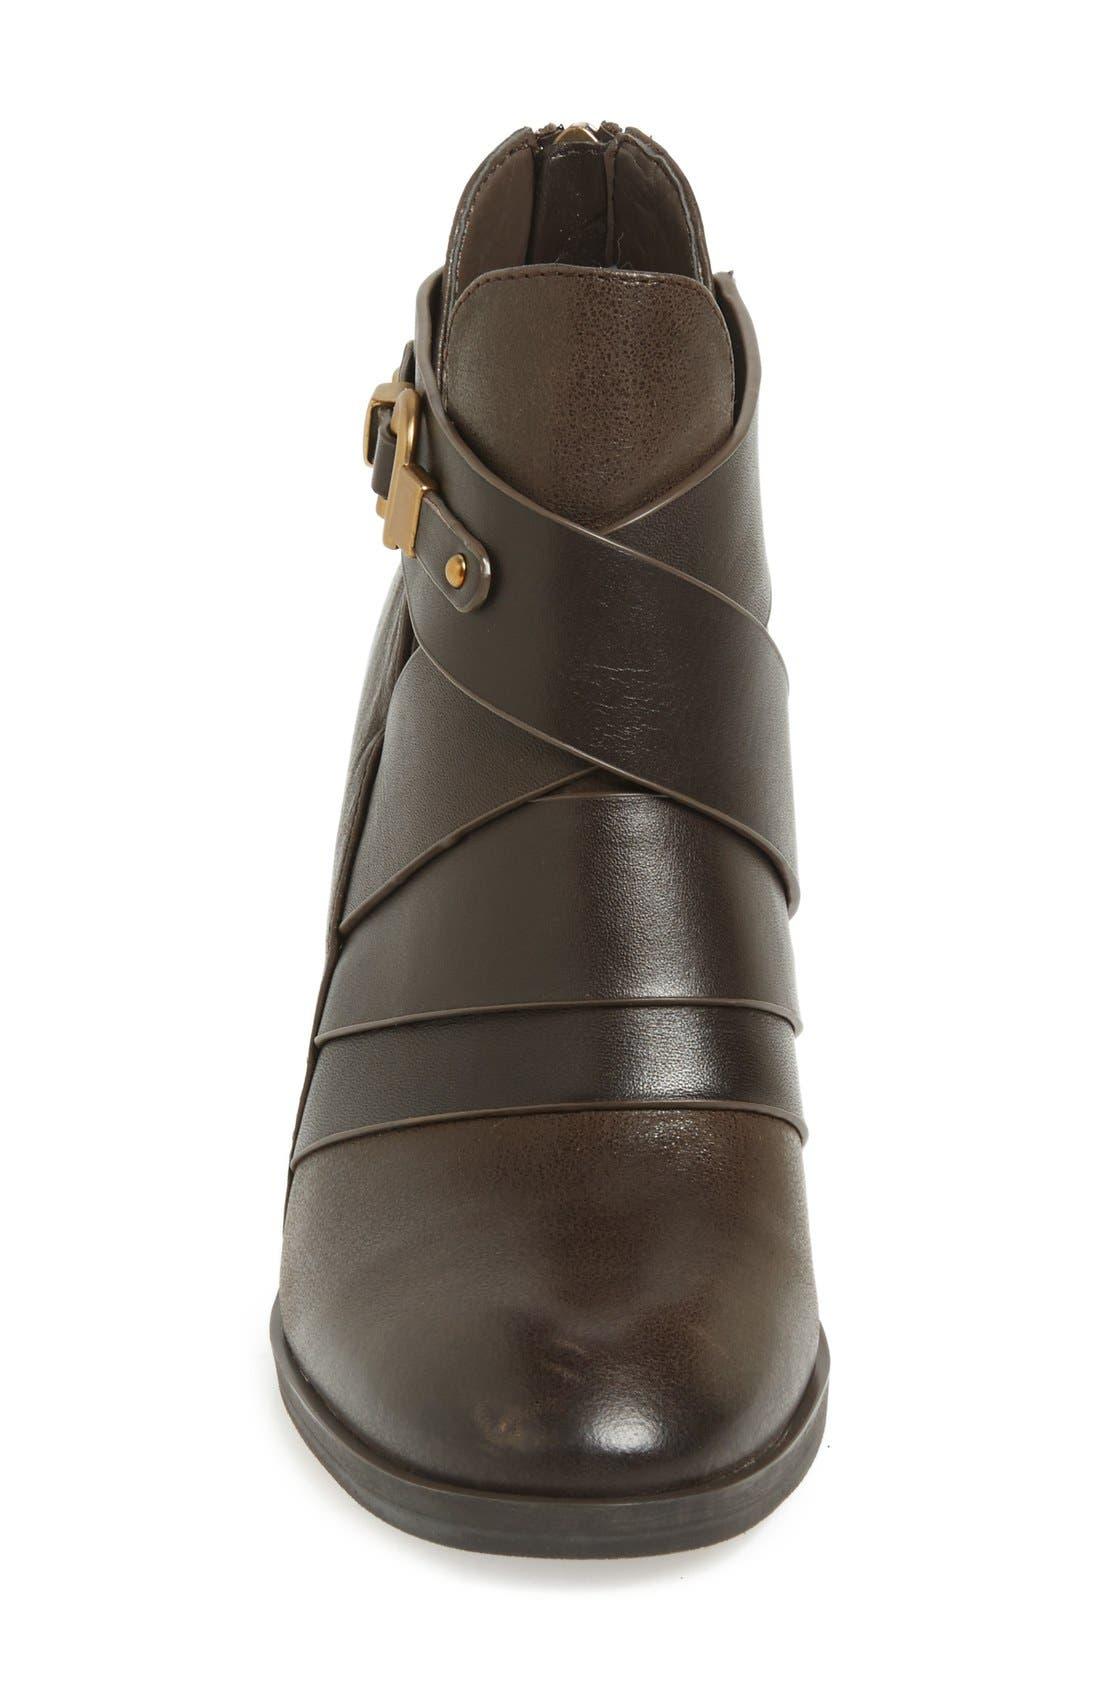 Isolà 'Ladora' Block Heel Bootie,                             Alternate thumbnail 3, color,                             Dark Brown Leather